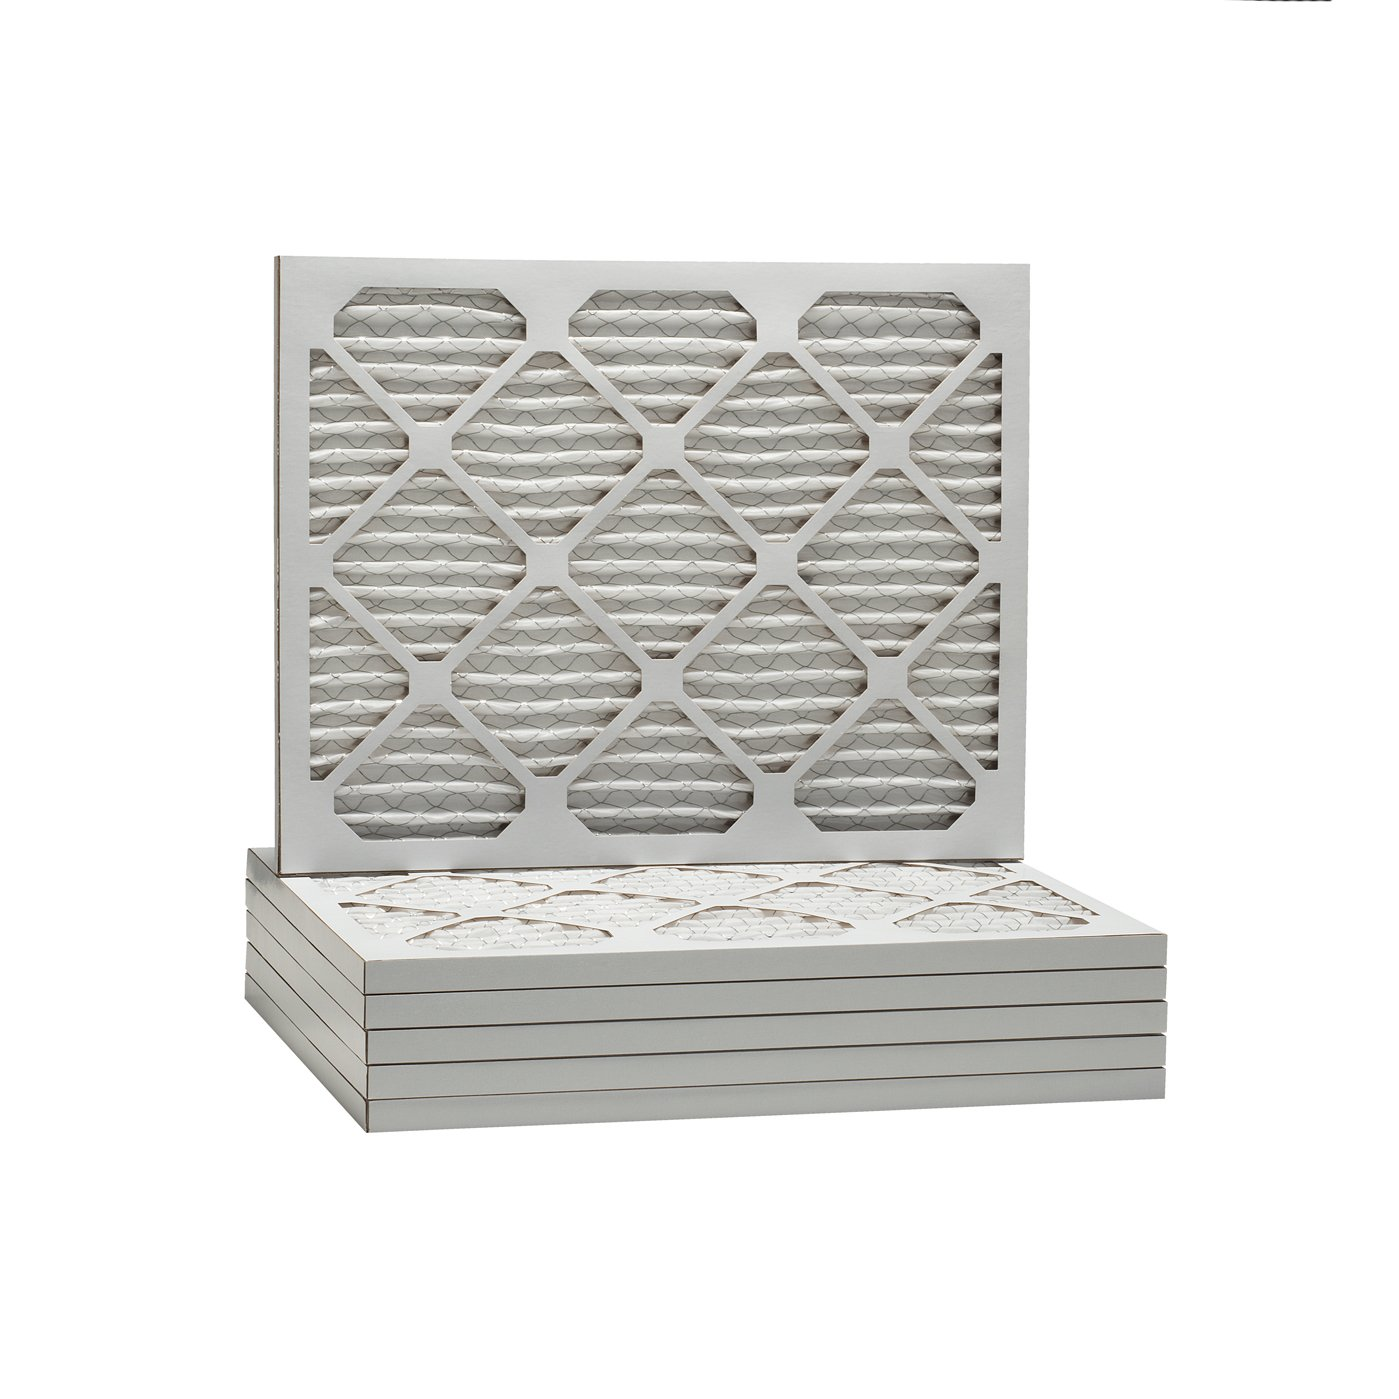 20 x 22 x 1 Dust &花粉MERV 8プリーツ交換用AC炉エアフィルタ( 6パック) B00FW0X6LI